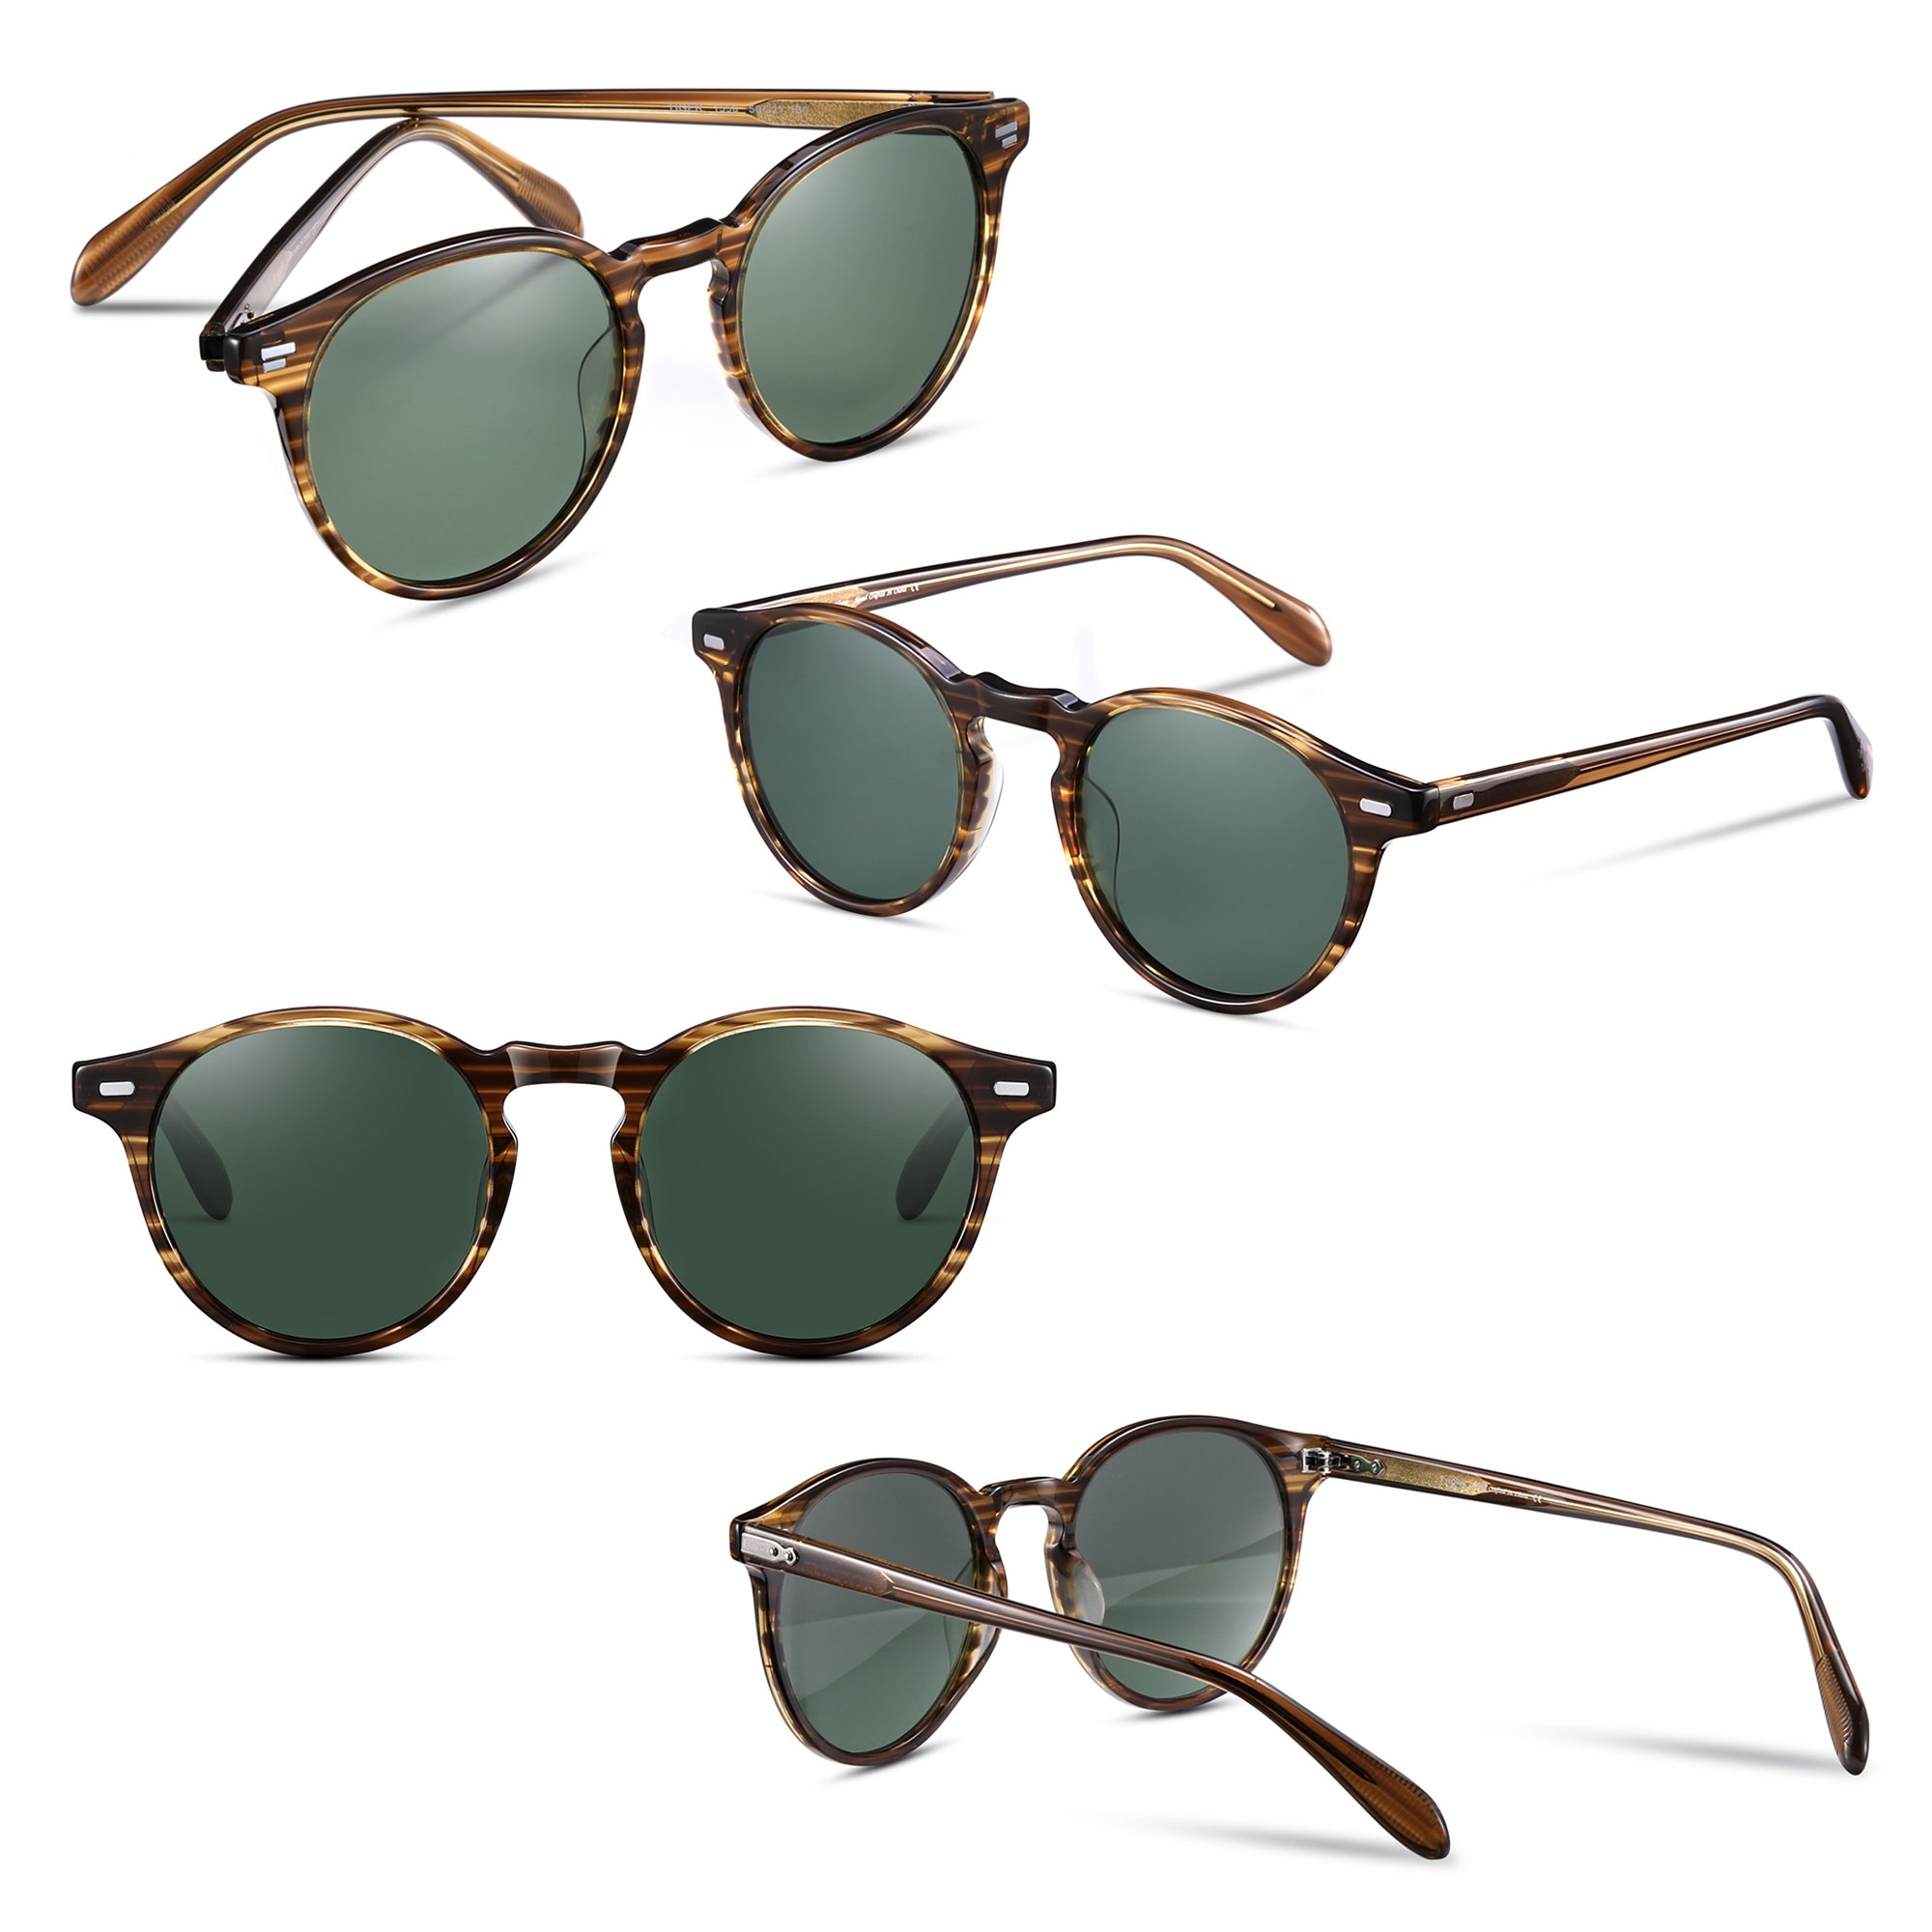 EyeGlow Vintage Round Sunglasses Women Sunglasses Men Polarized Lens 5187 Acetate material (Blonde vs green polarized lens, As pictures) by EyeGlow (Image #2)